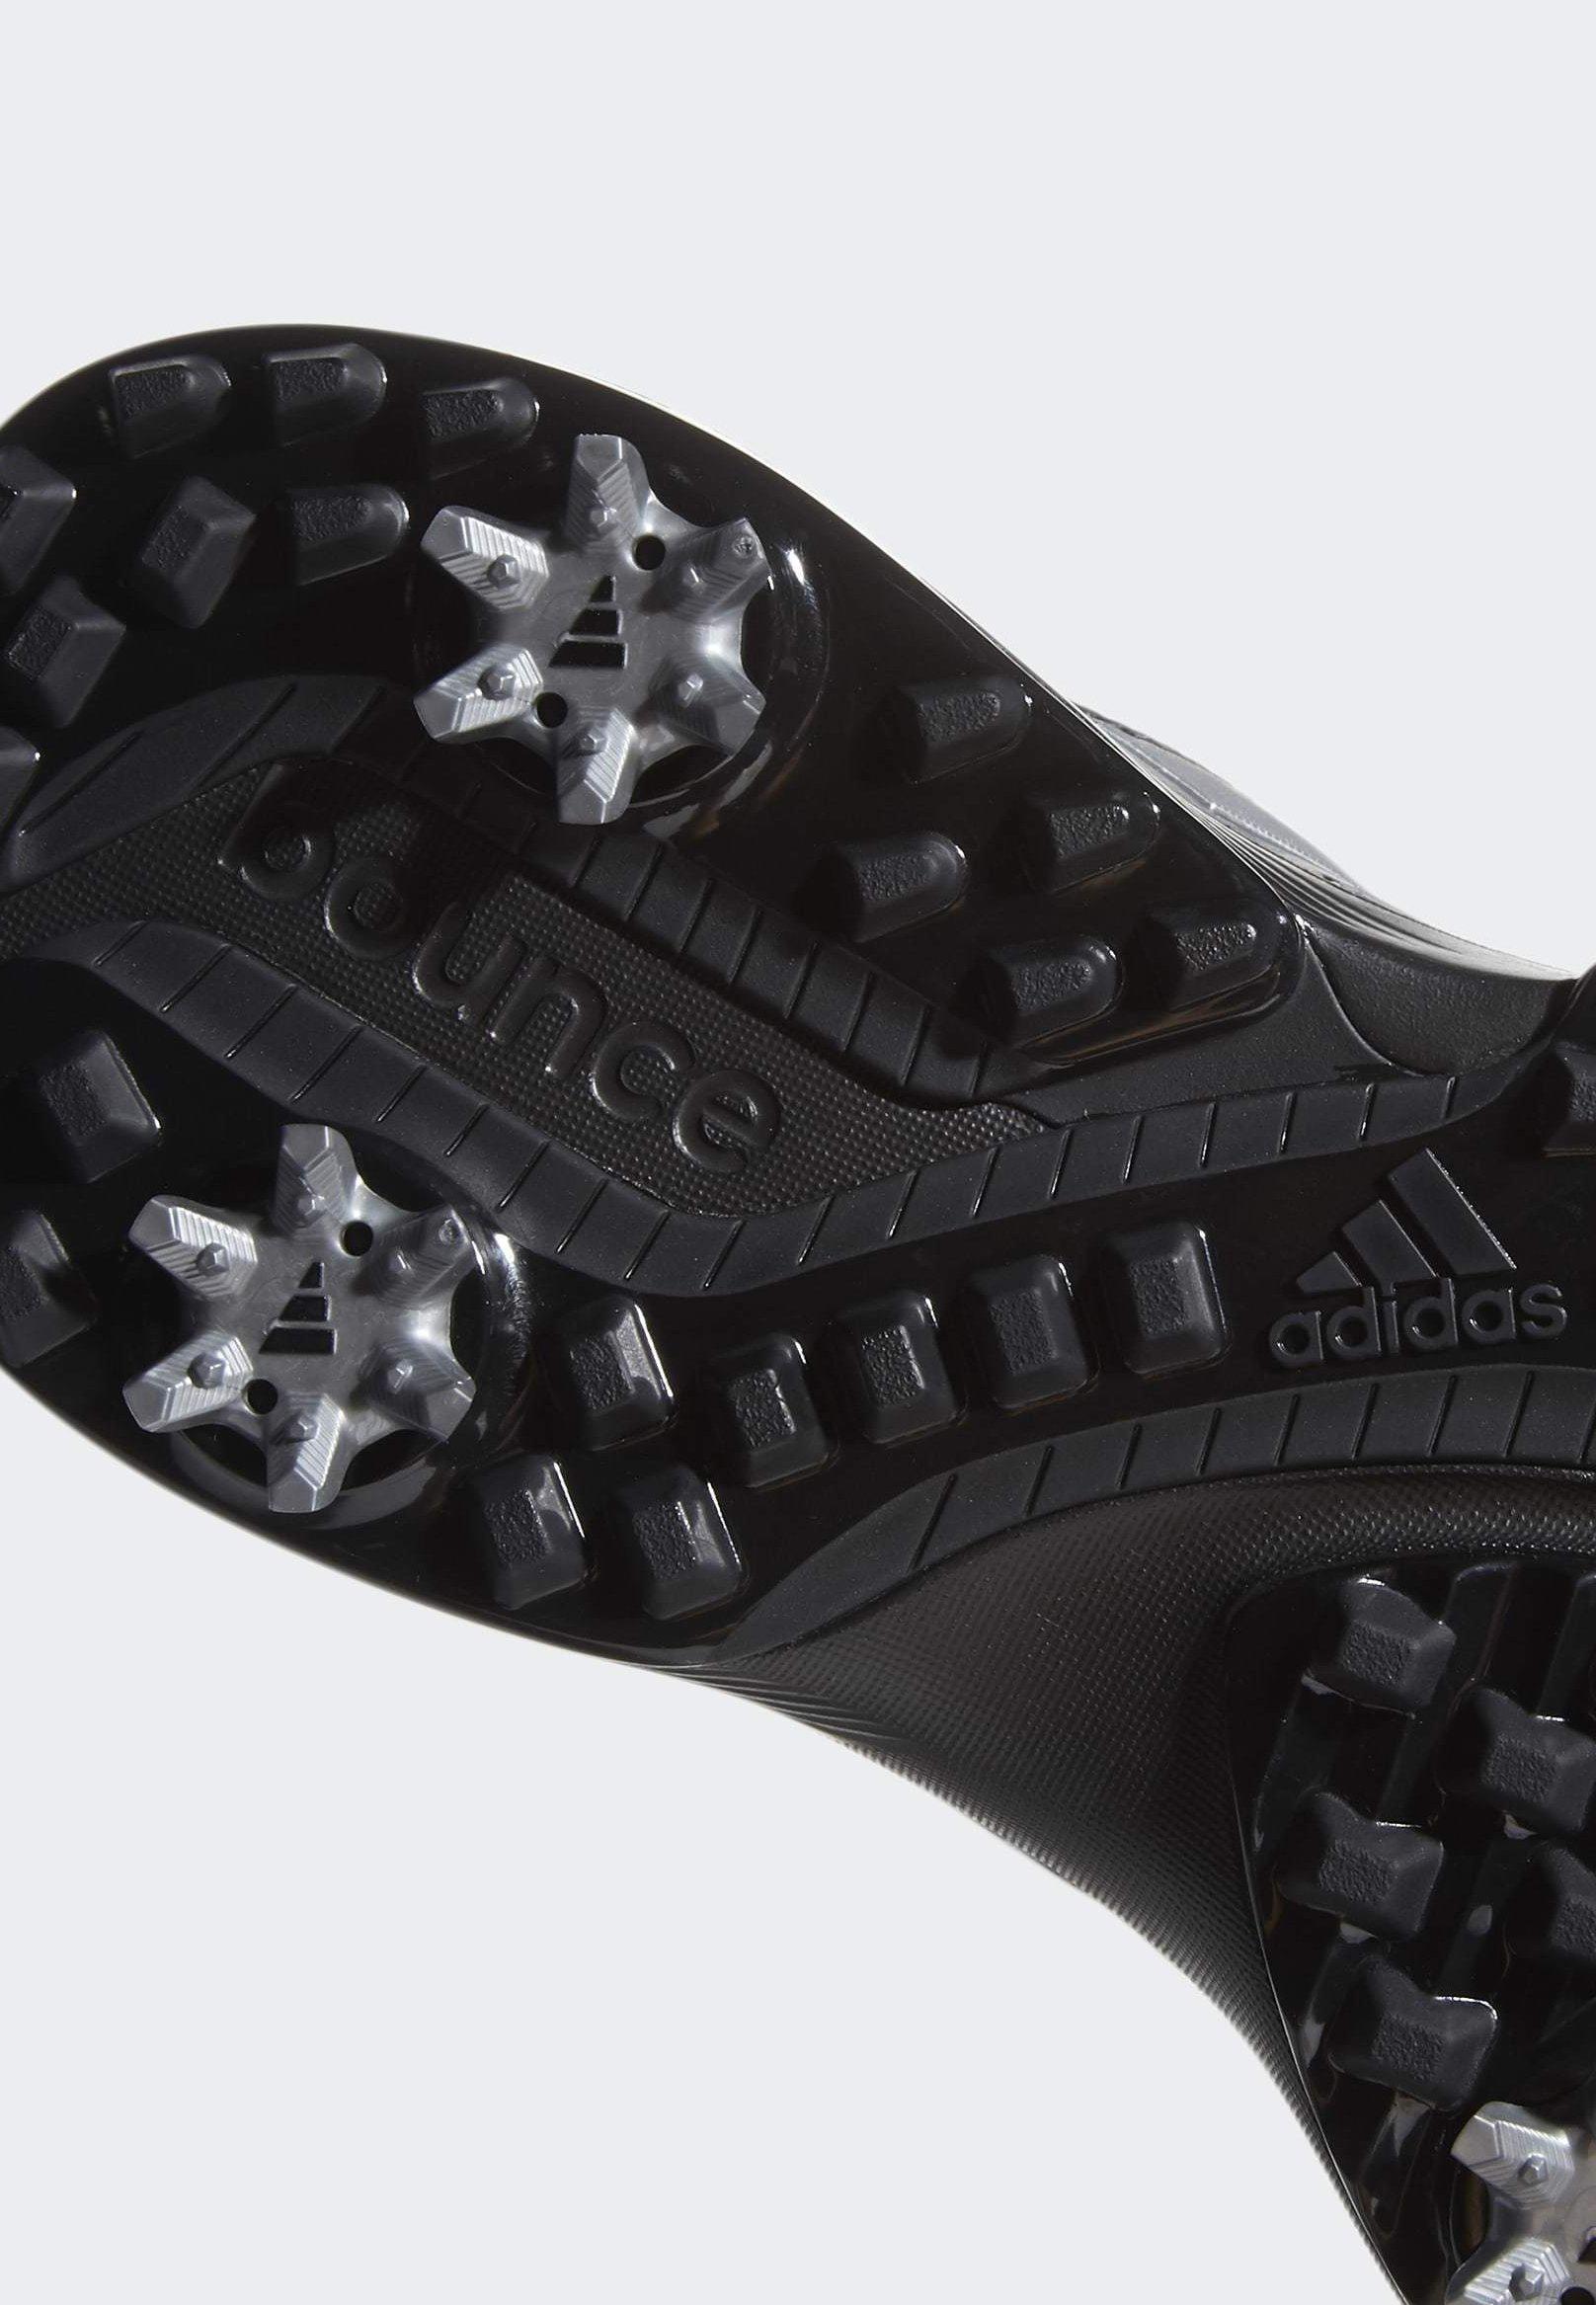 Adidas Golf 360 Bounce 2.0 Shoes - Golfskor Black